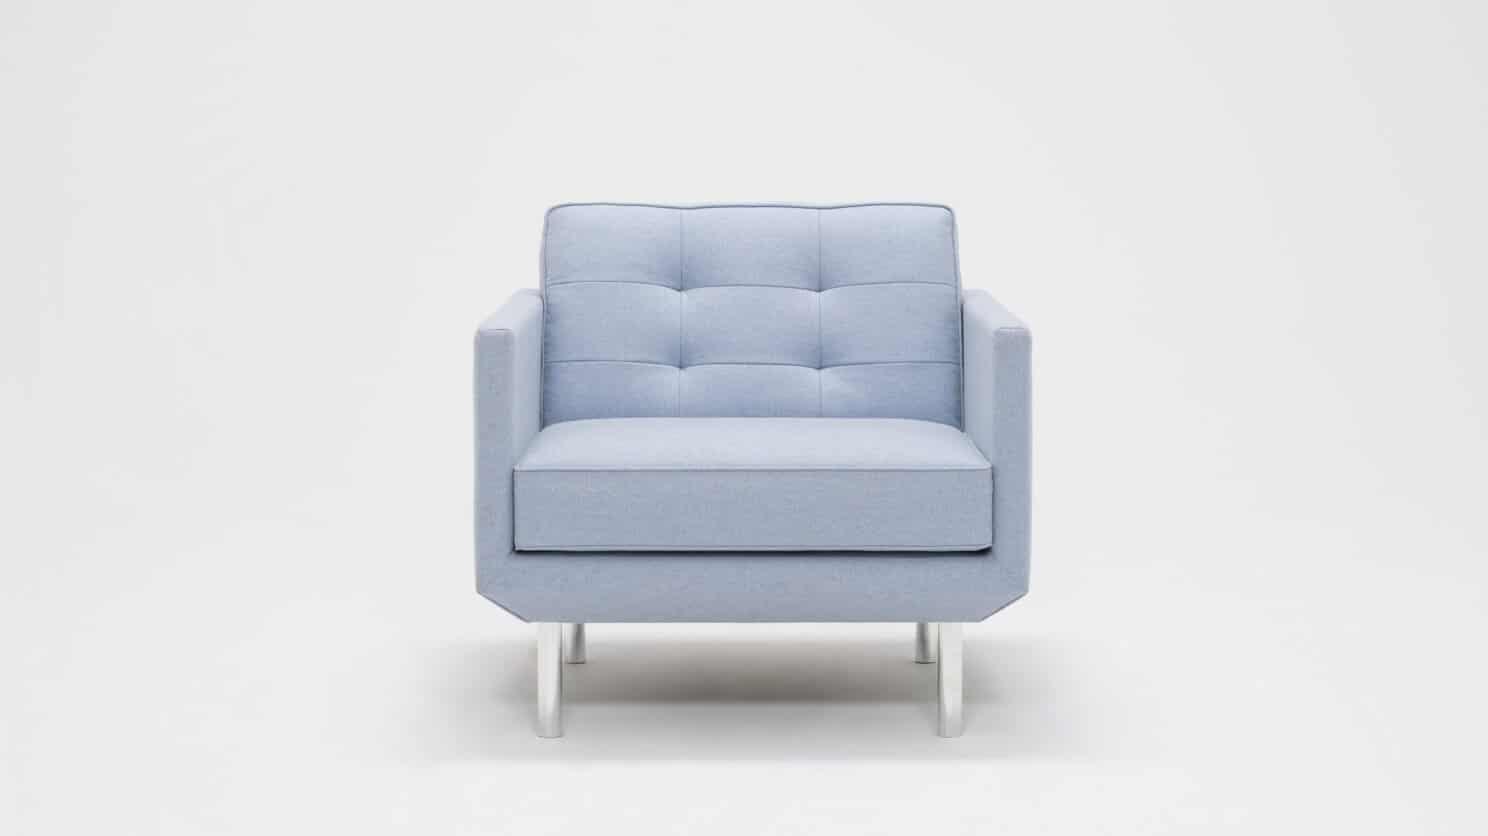 30155 95 par bp 1 chairs plateau club chair foam lana light blue front 02